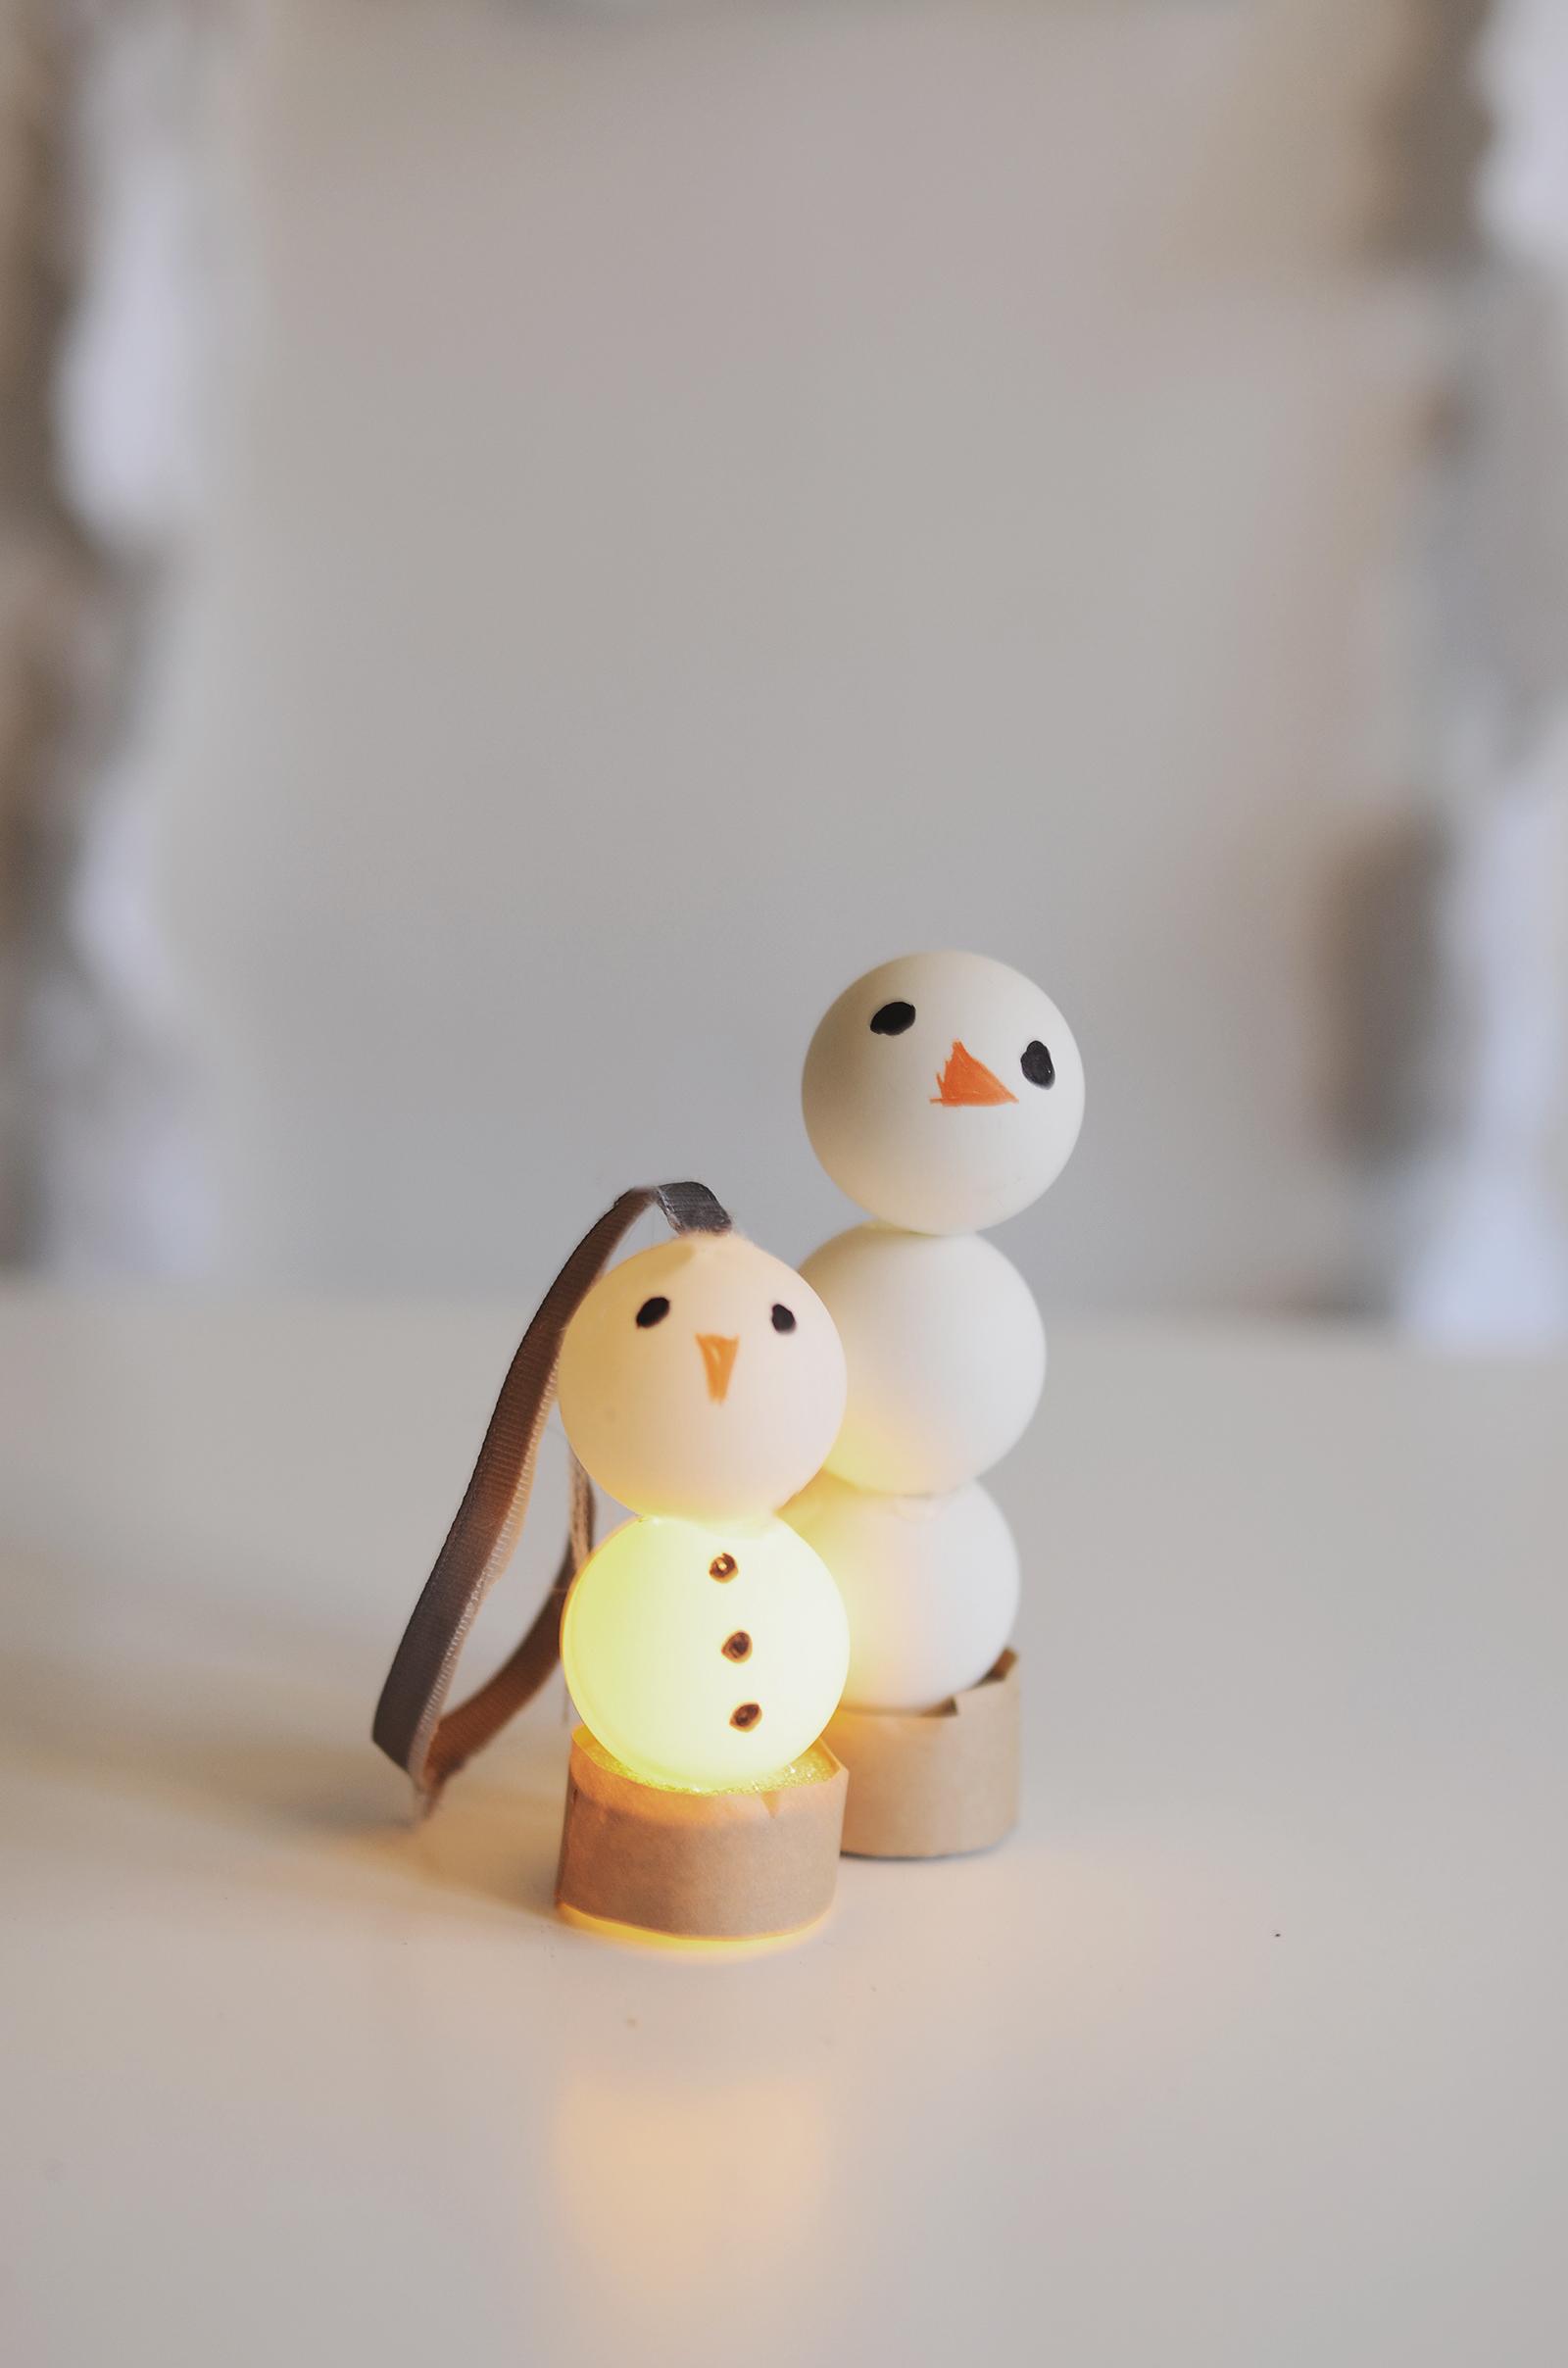 SNOWMAN_1600_MAIN_LIGHTa